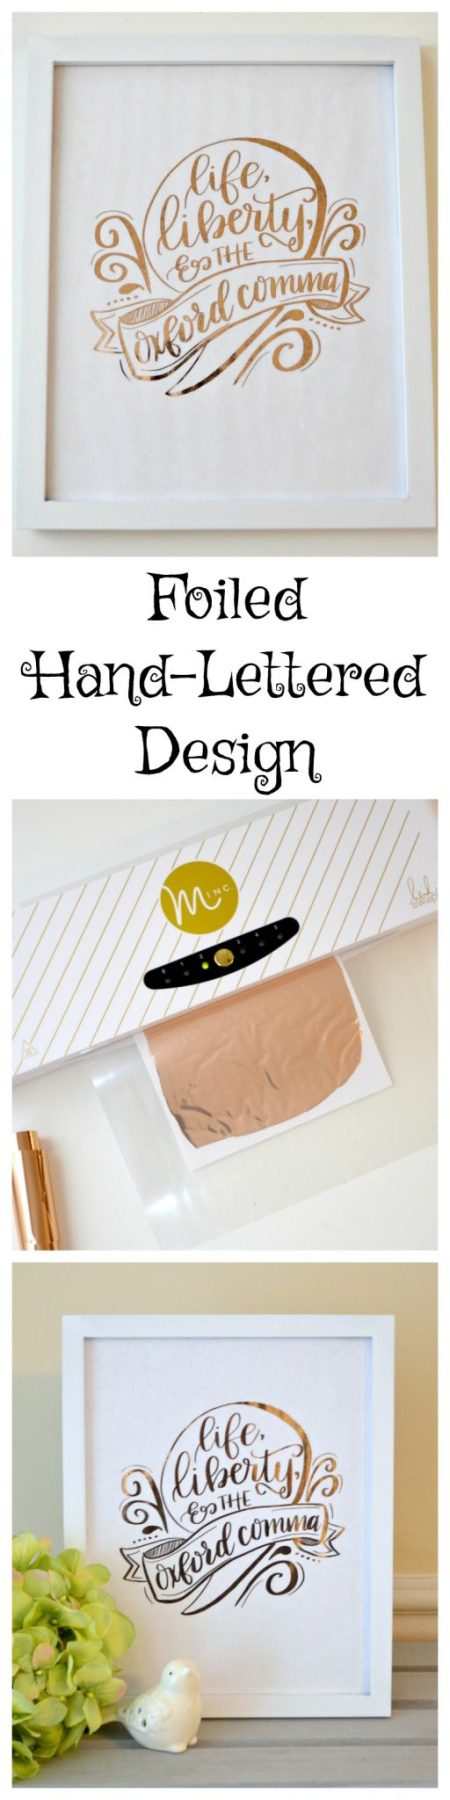 Foiled Hand Lettered Oxford Comma Design